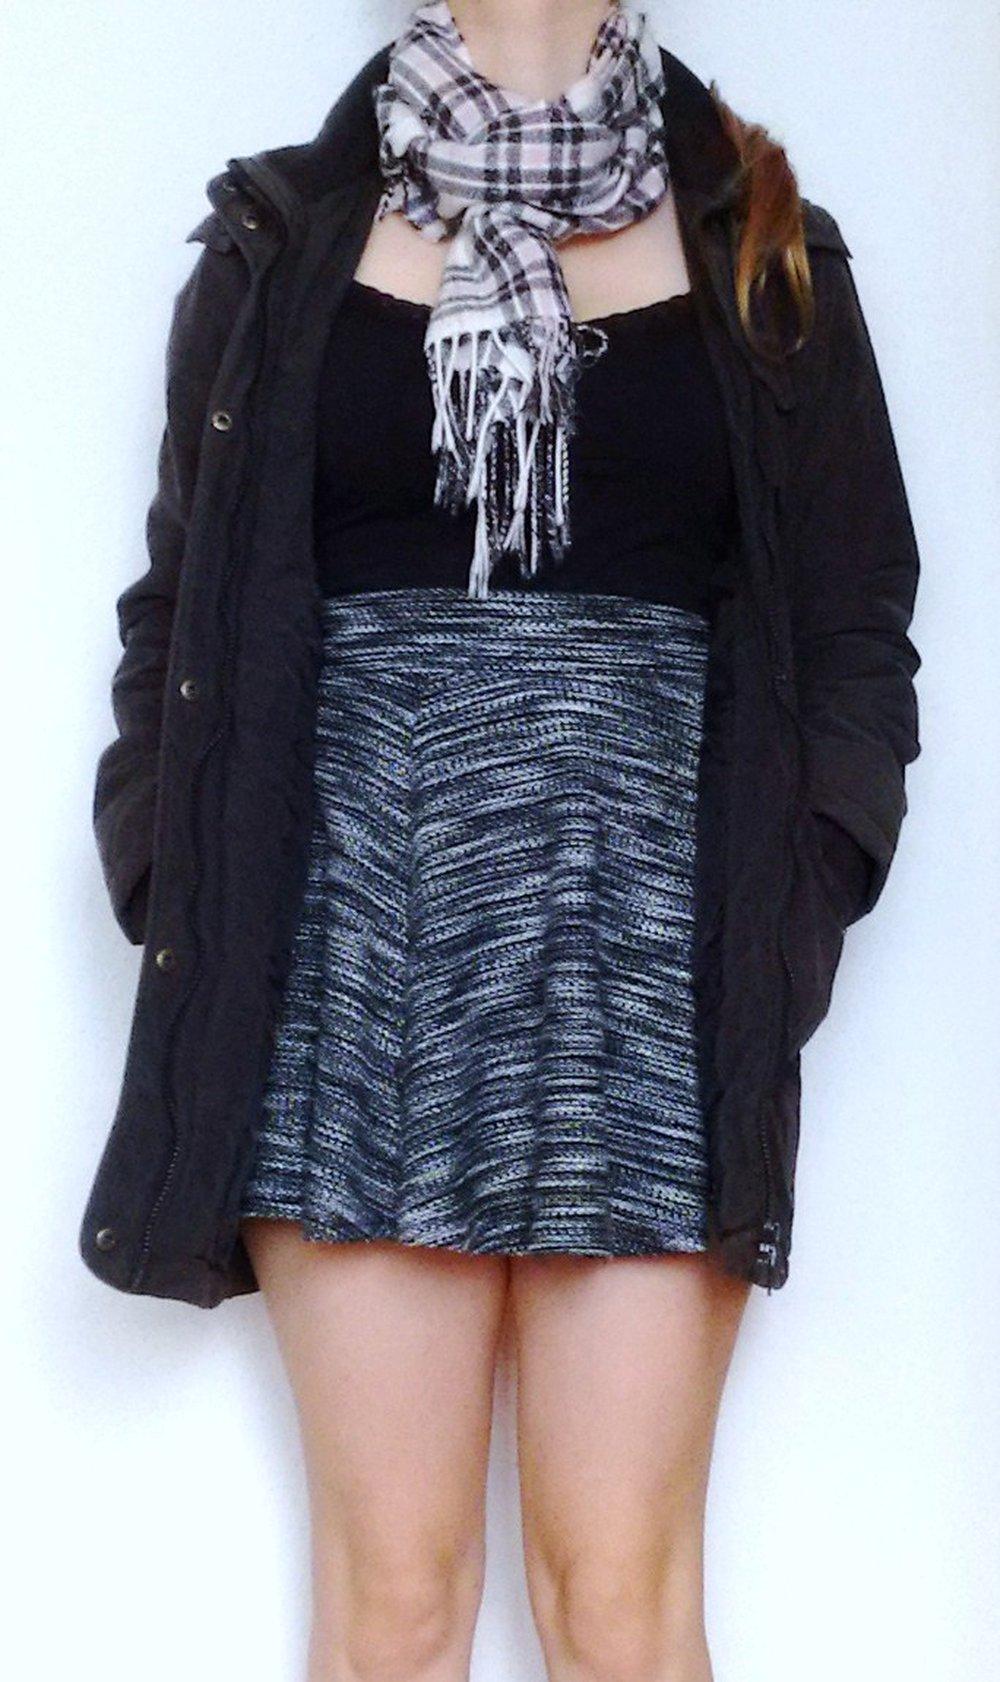 Mantel Kapuzenmantel anthrazit grau schwarz figurbetont, Parka, Übergangsjacke, Outdoorjacke, Daunenmantel, Daunenjacke, Gothic Emo Blogger